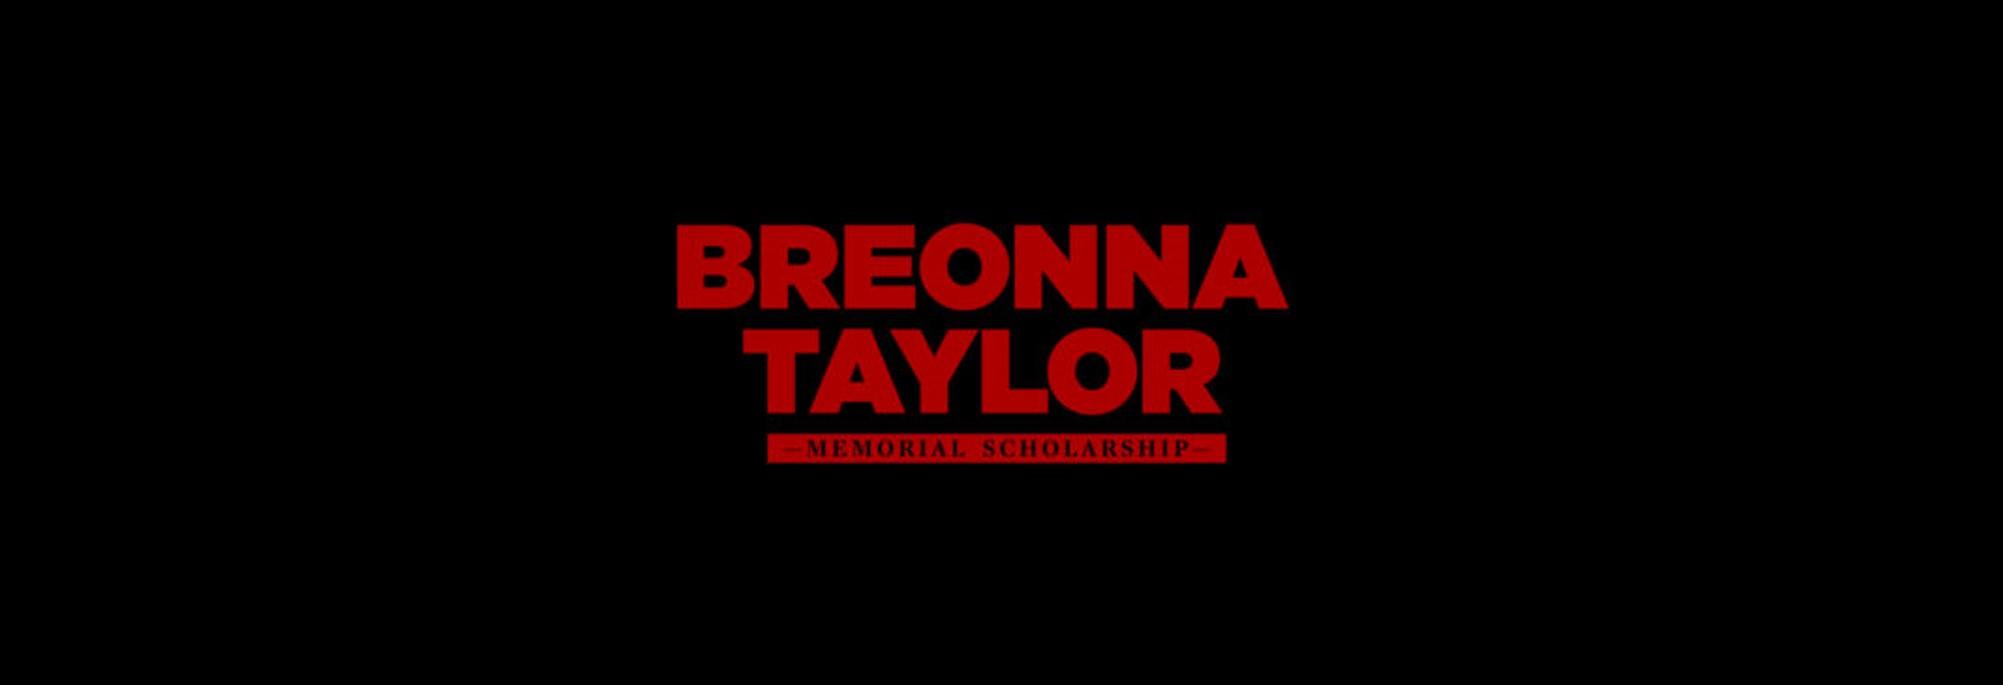 Breonna Taylor Memorial Scholarship